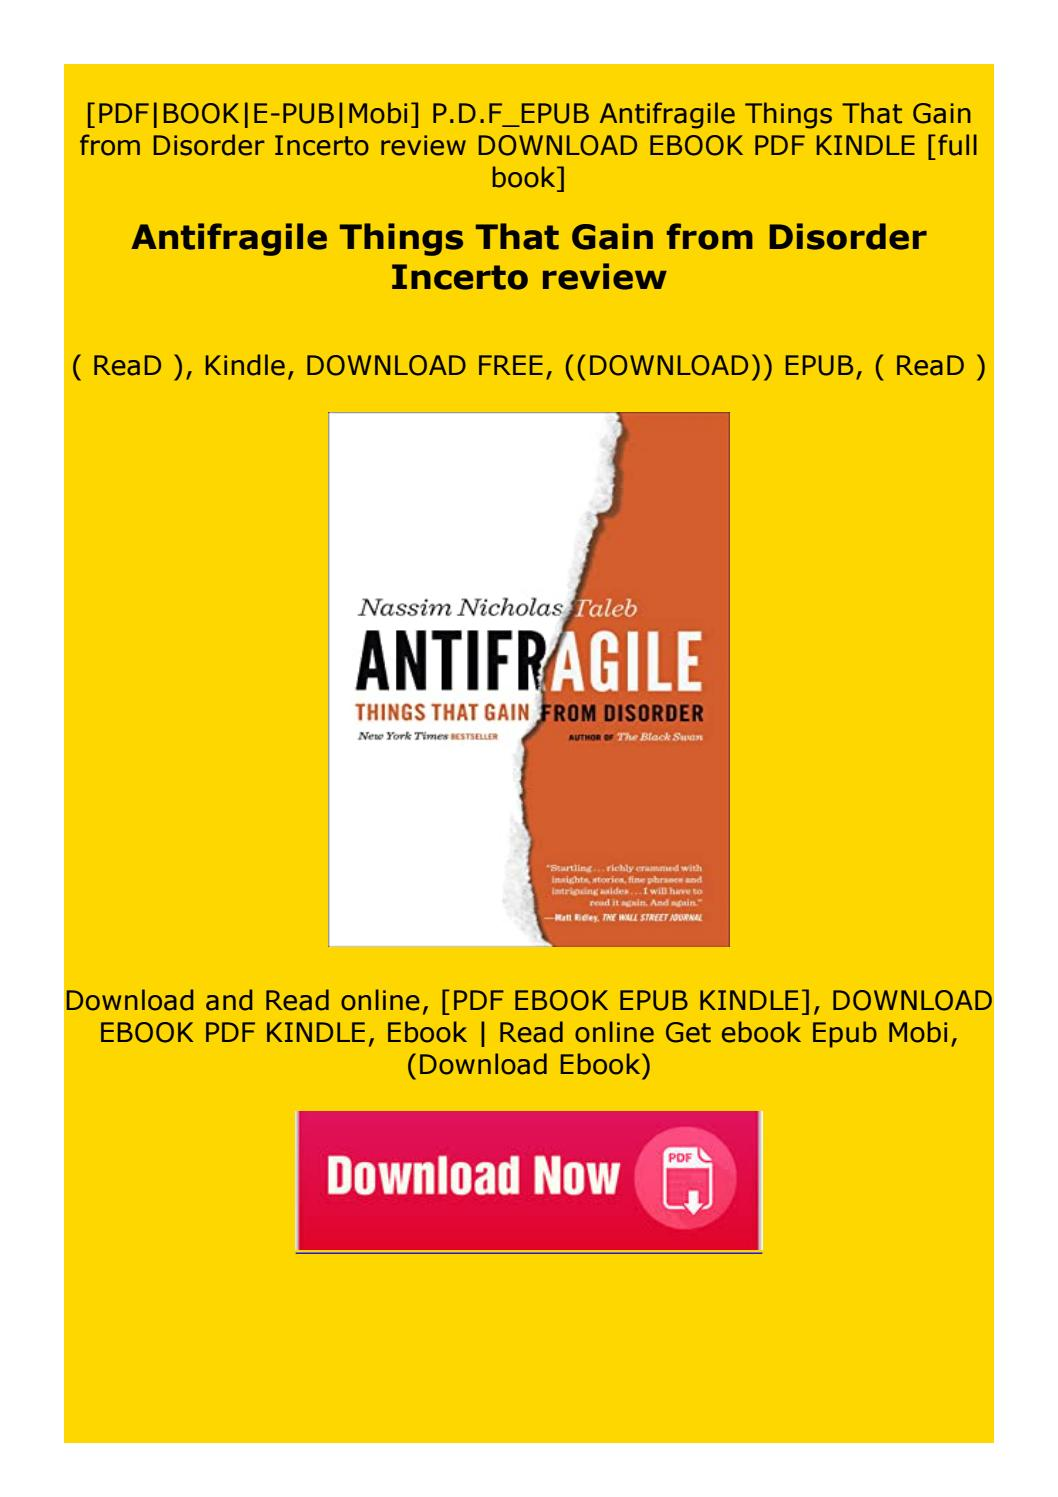 antifragile things that gain from disorder free pdf